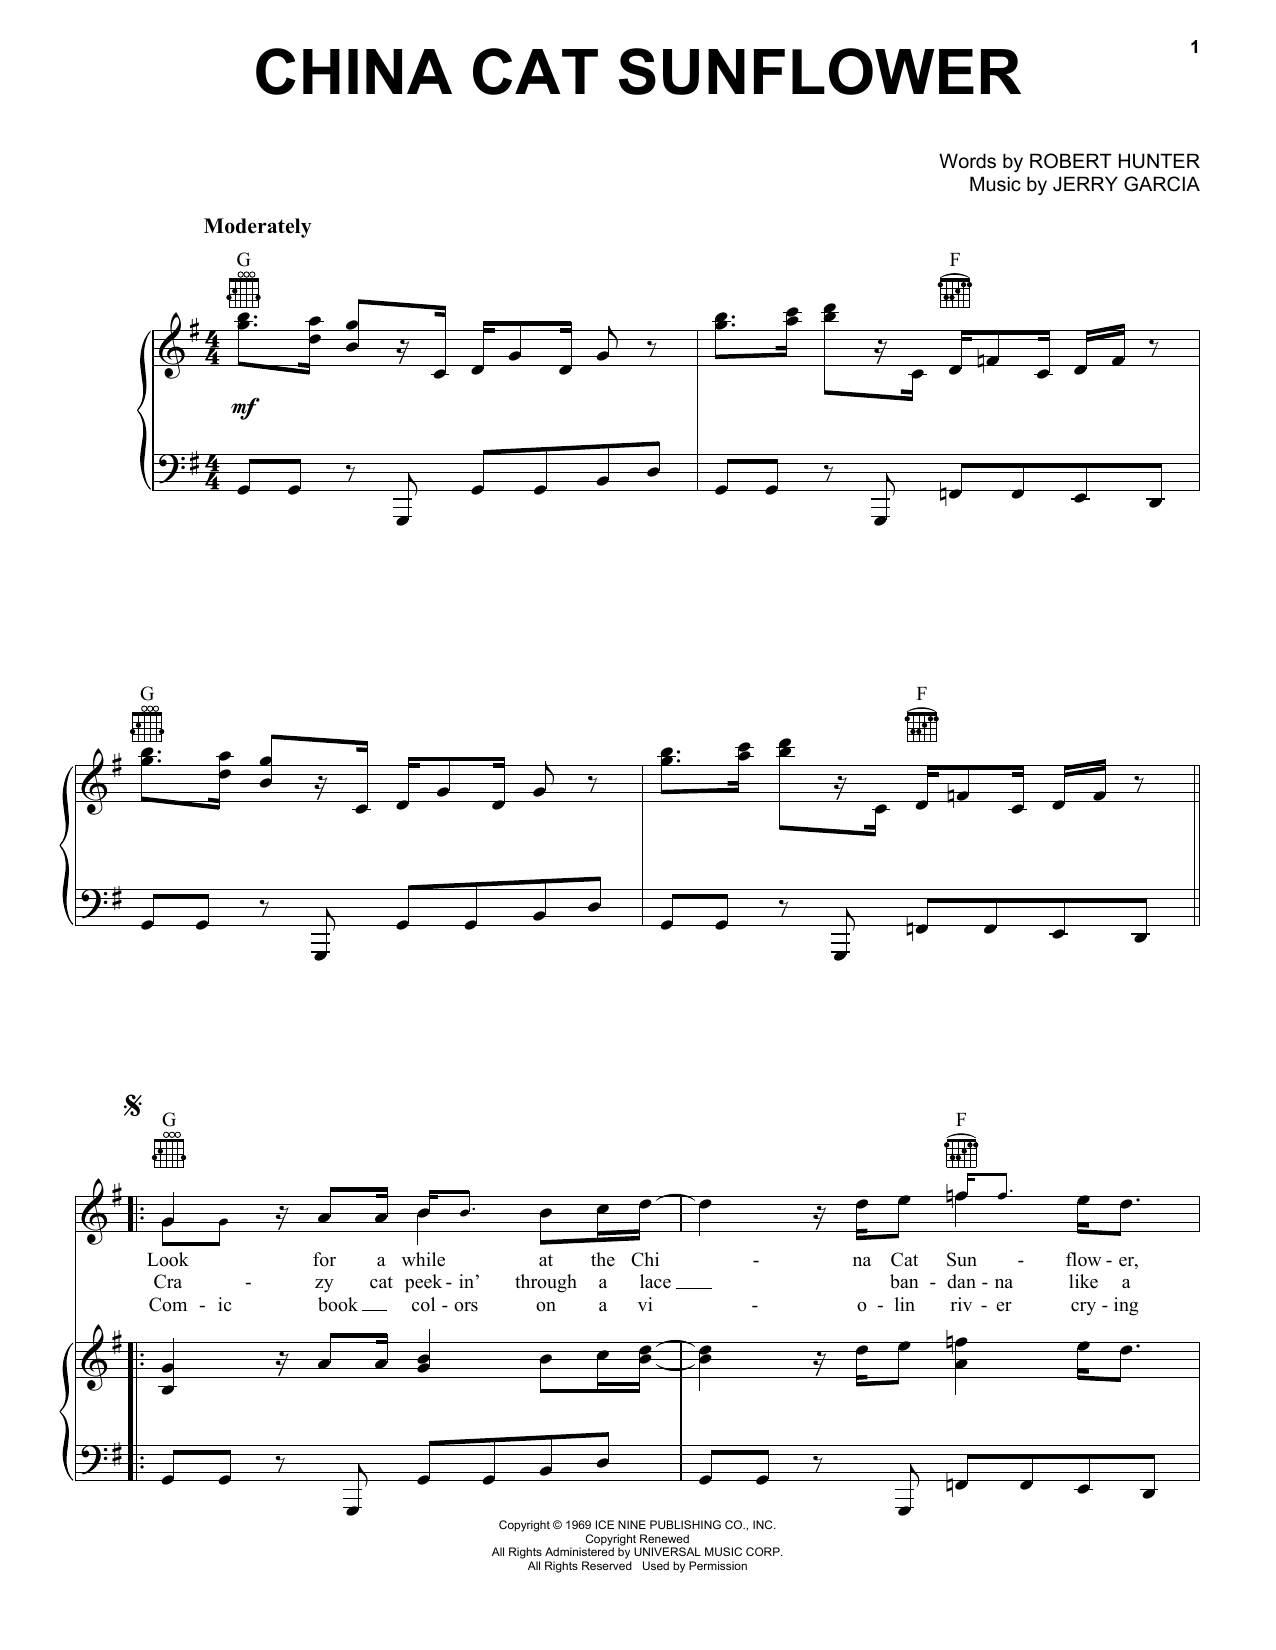 Grateful Dead China Cat Sunflower Sheet Music Notes, Chords   Download  Printable Guitar Tab PDF Score   SKU 15